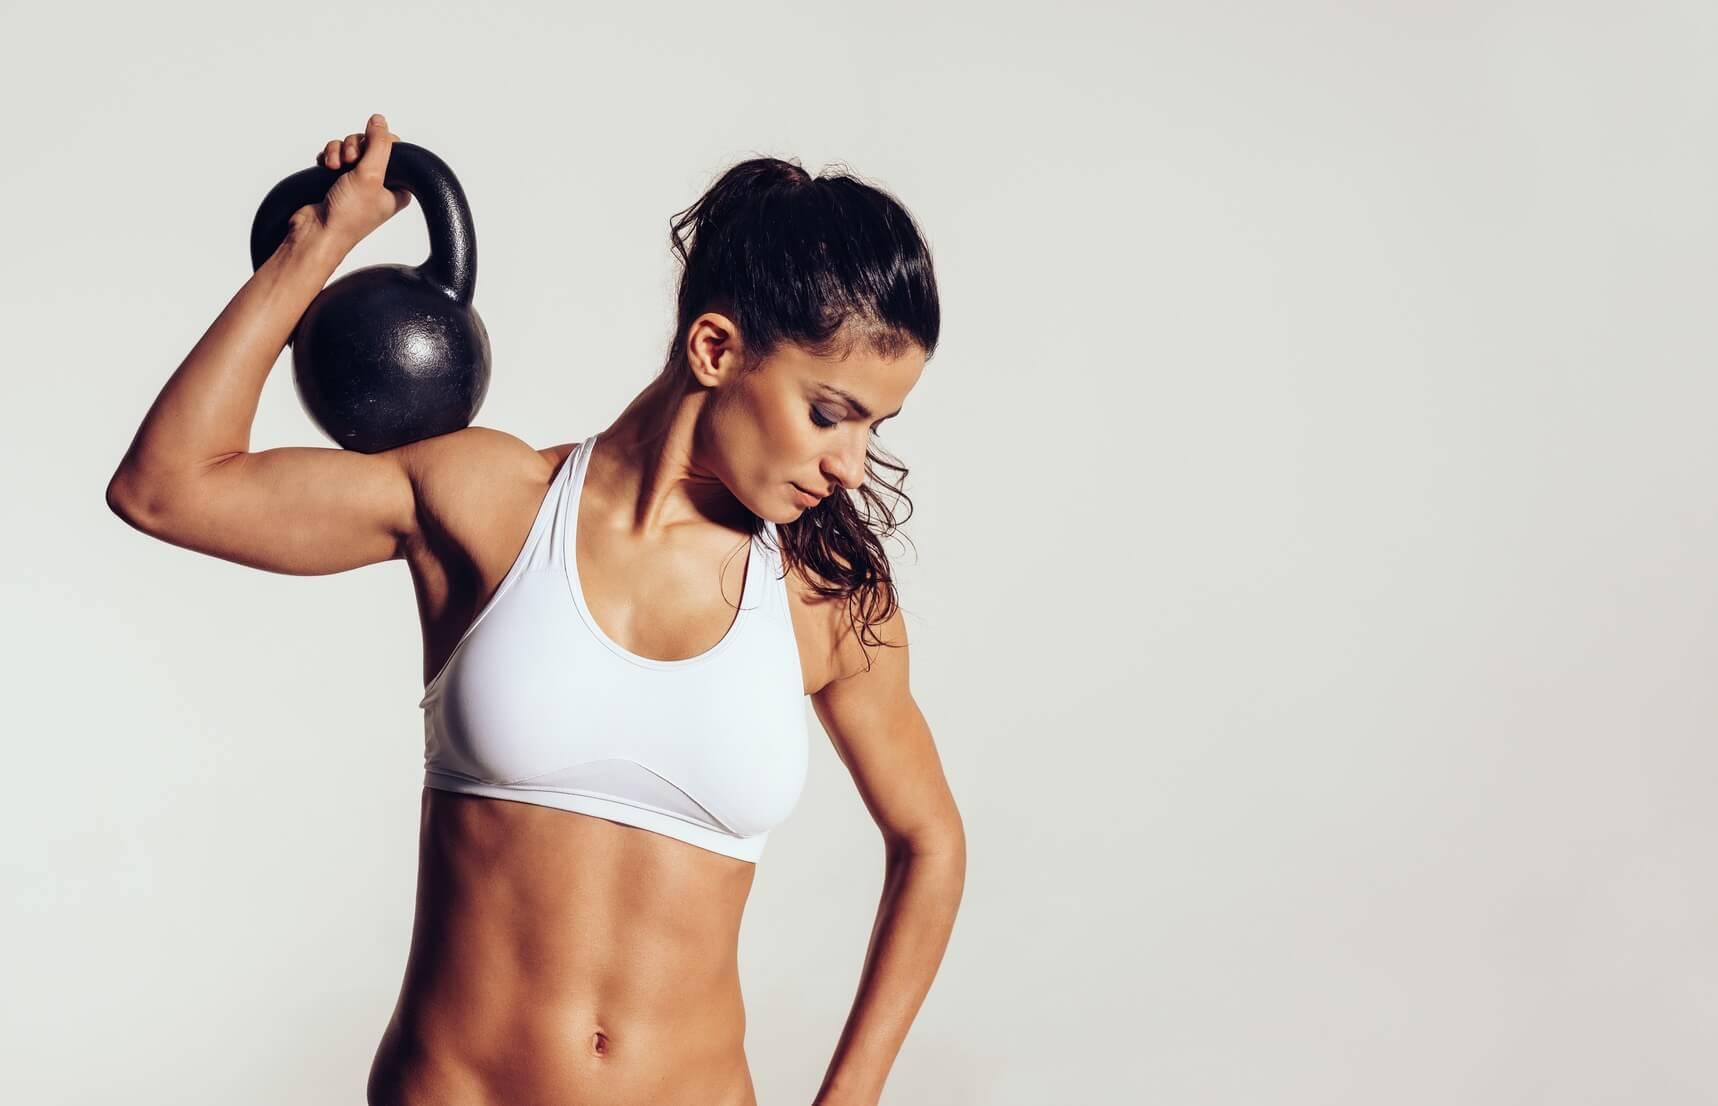 Kettlebell Training bei BodyChange FIT